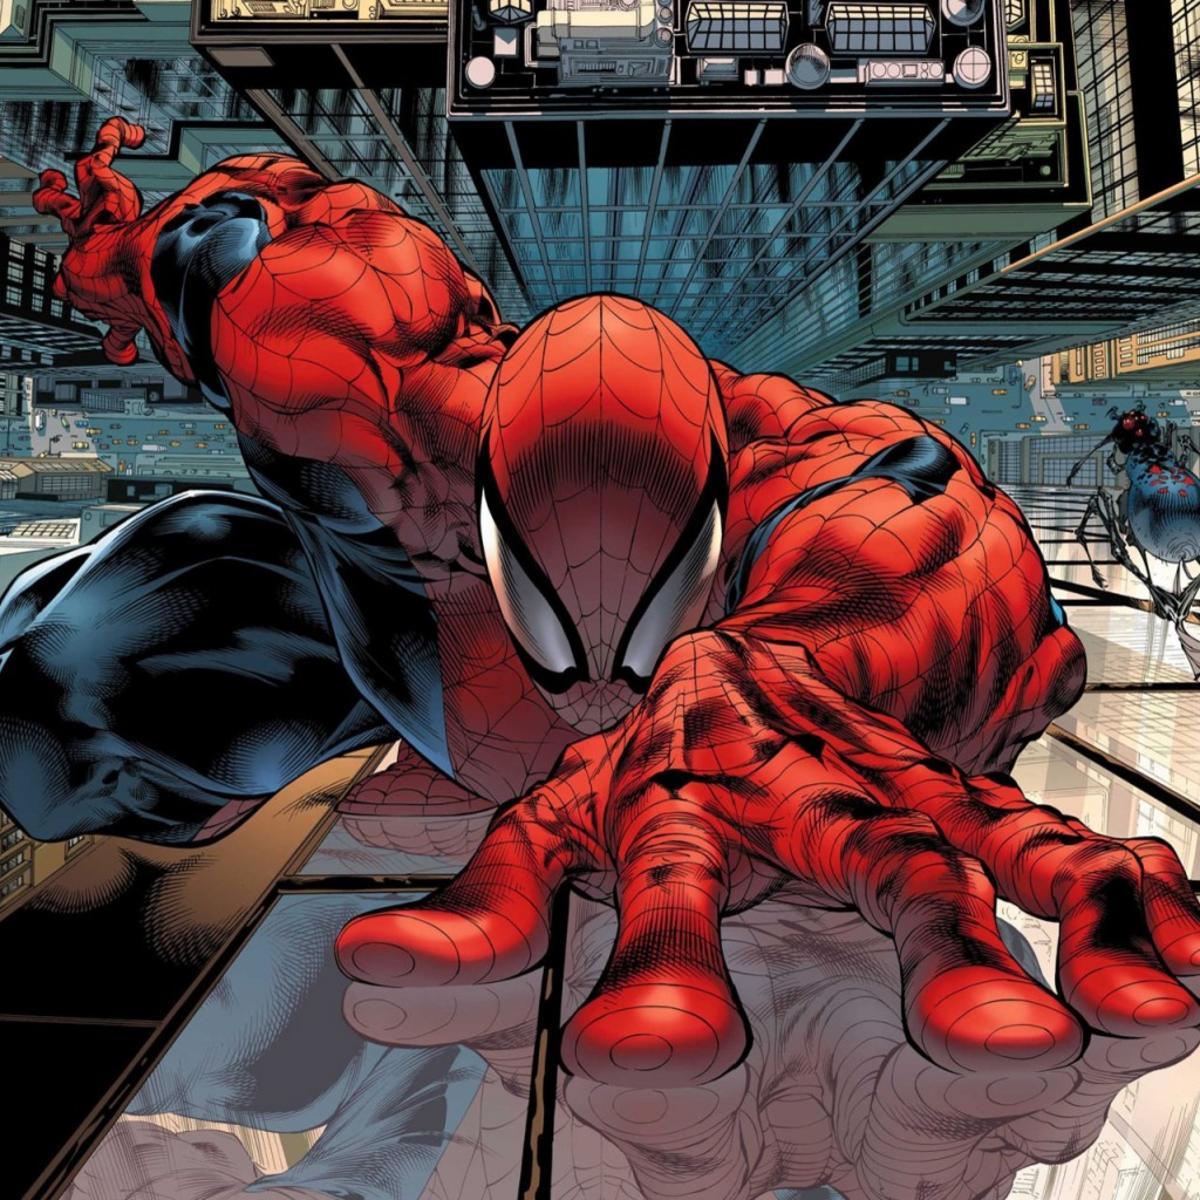 Spider-Man_wallcrawling_comics.png